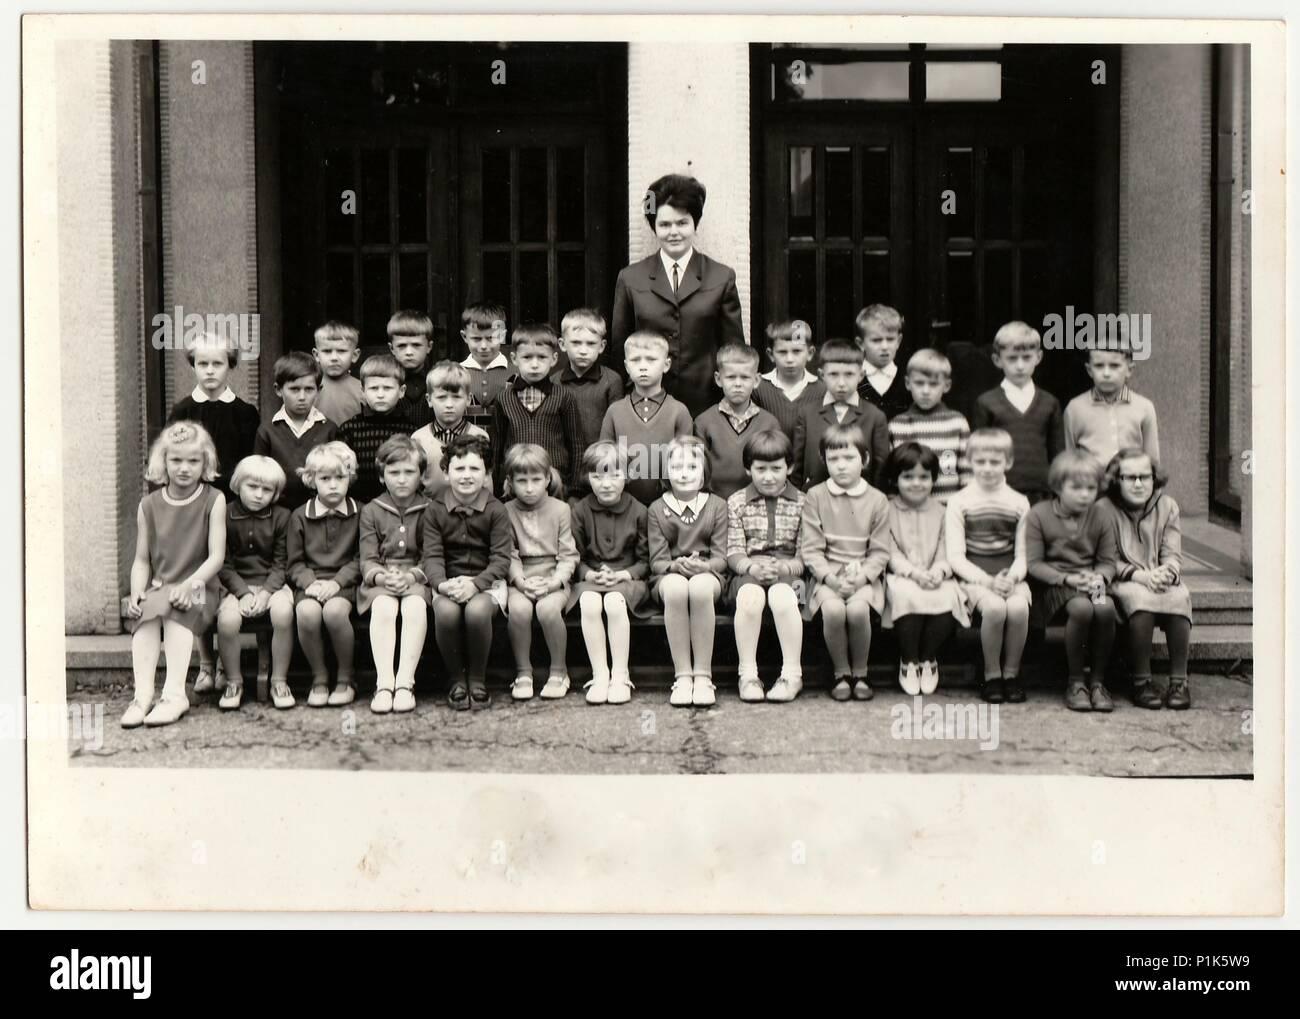 THE CZECHOSLOVAK SOCIALIST REPUBLIC - 1968: Vintage photo shows pupils (schoolmates) pose in front of school. Black & white antique photo. - Stock Image